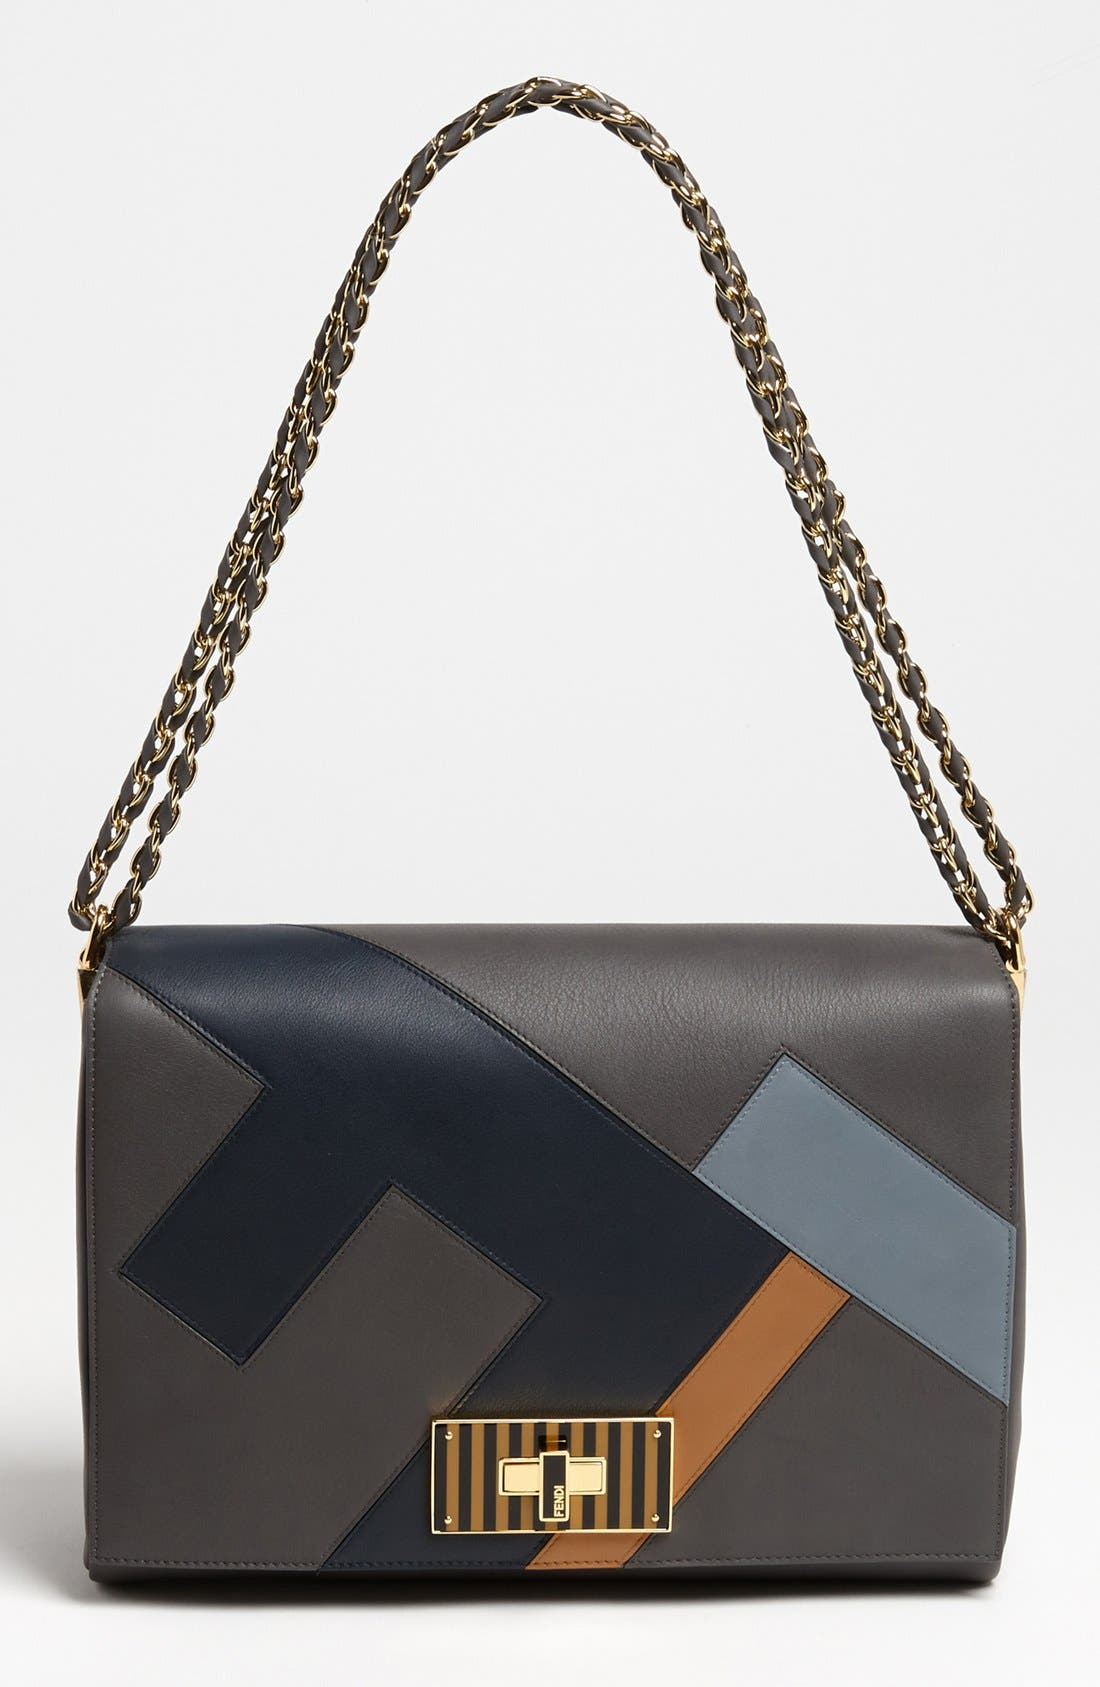 Alternate Image 1 Selected - Fendi 'Claudia - Medium' Leather Shoulder Bag